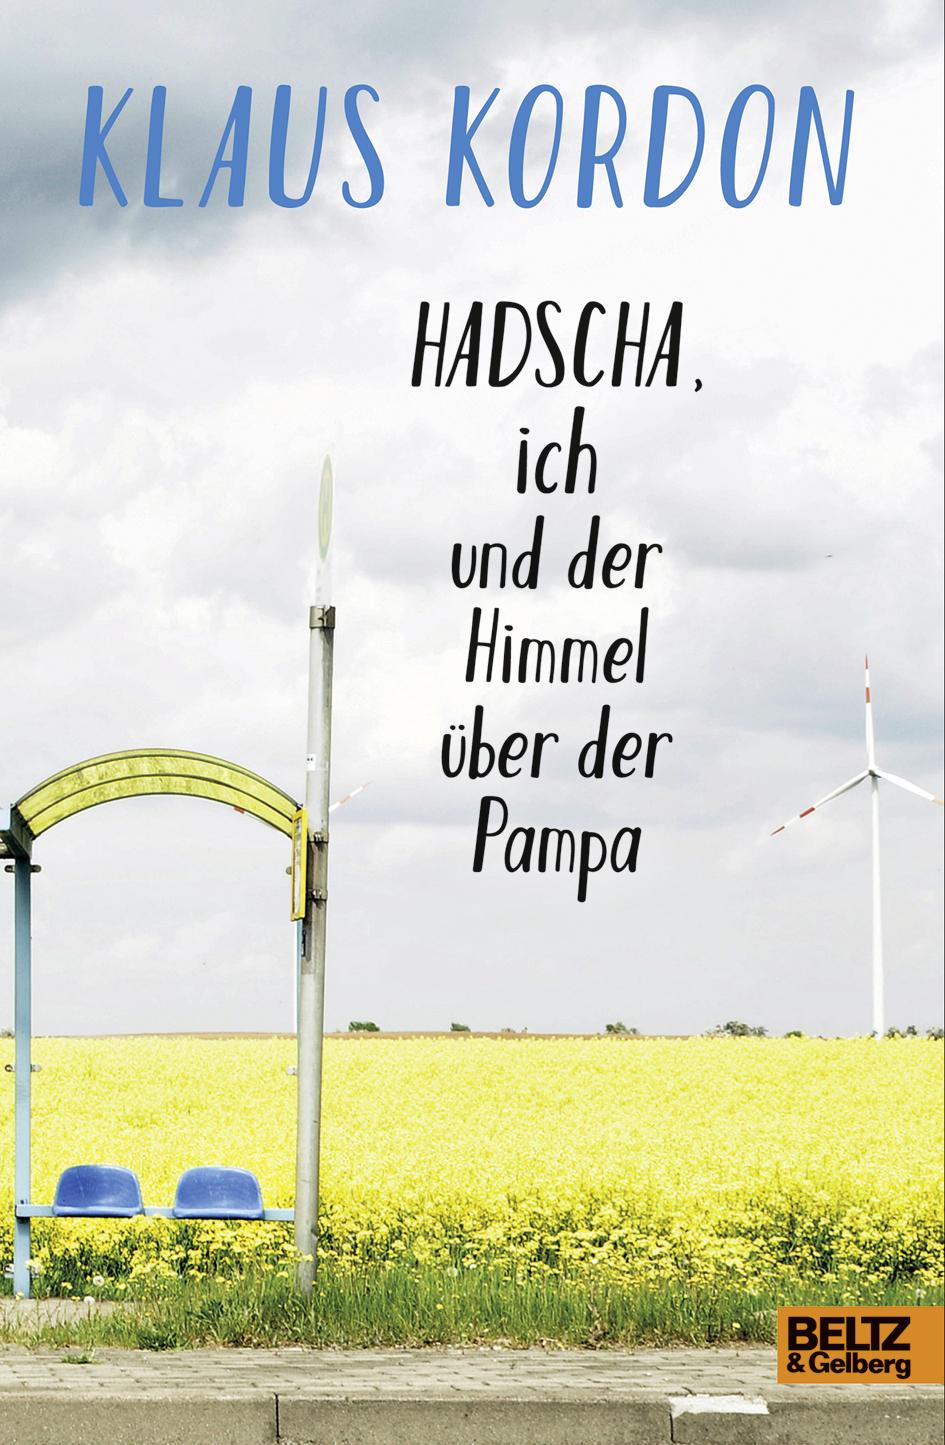 75434_KJB_Kordon_Hadscha_SU.indd